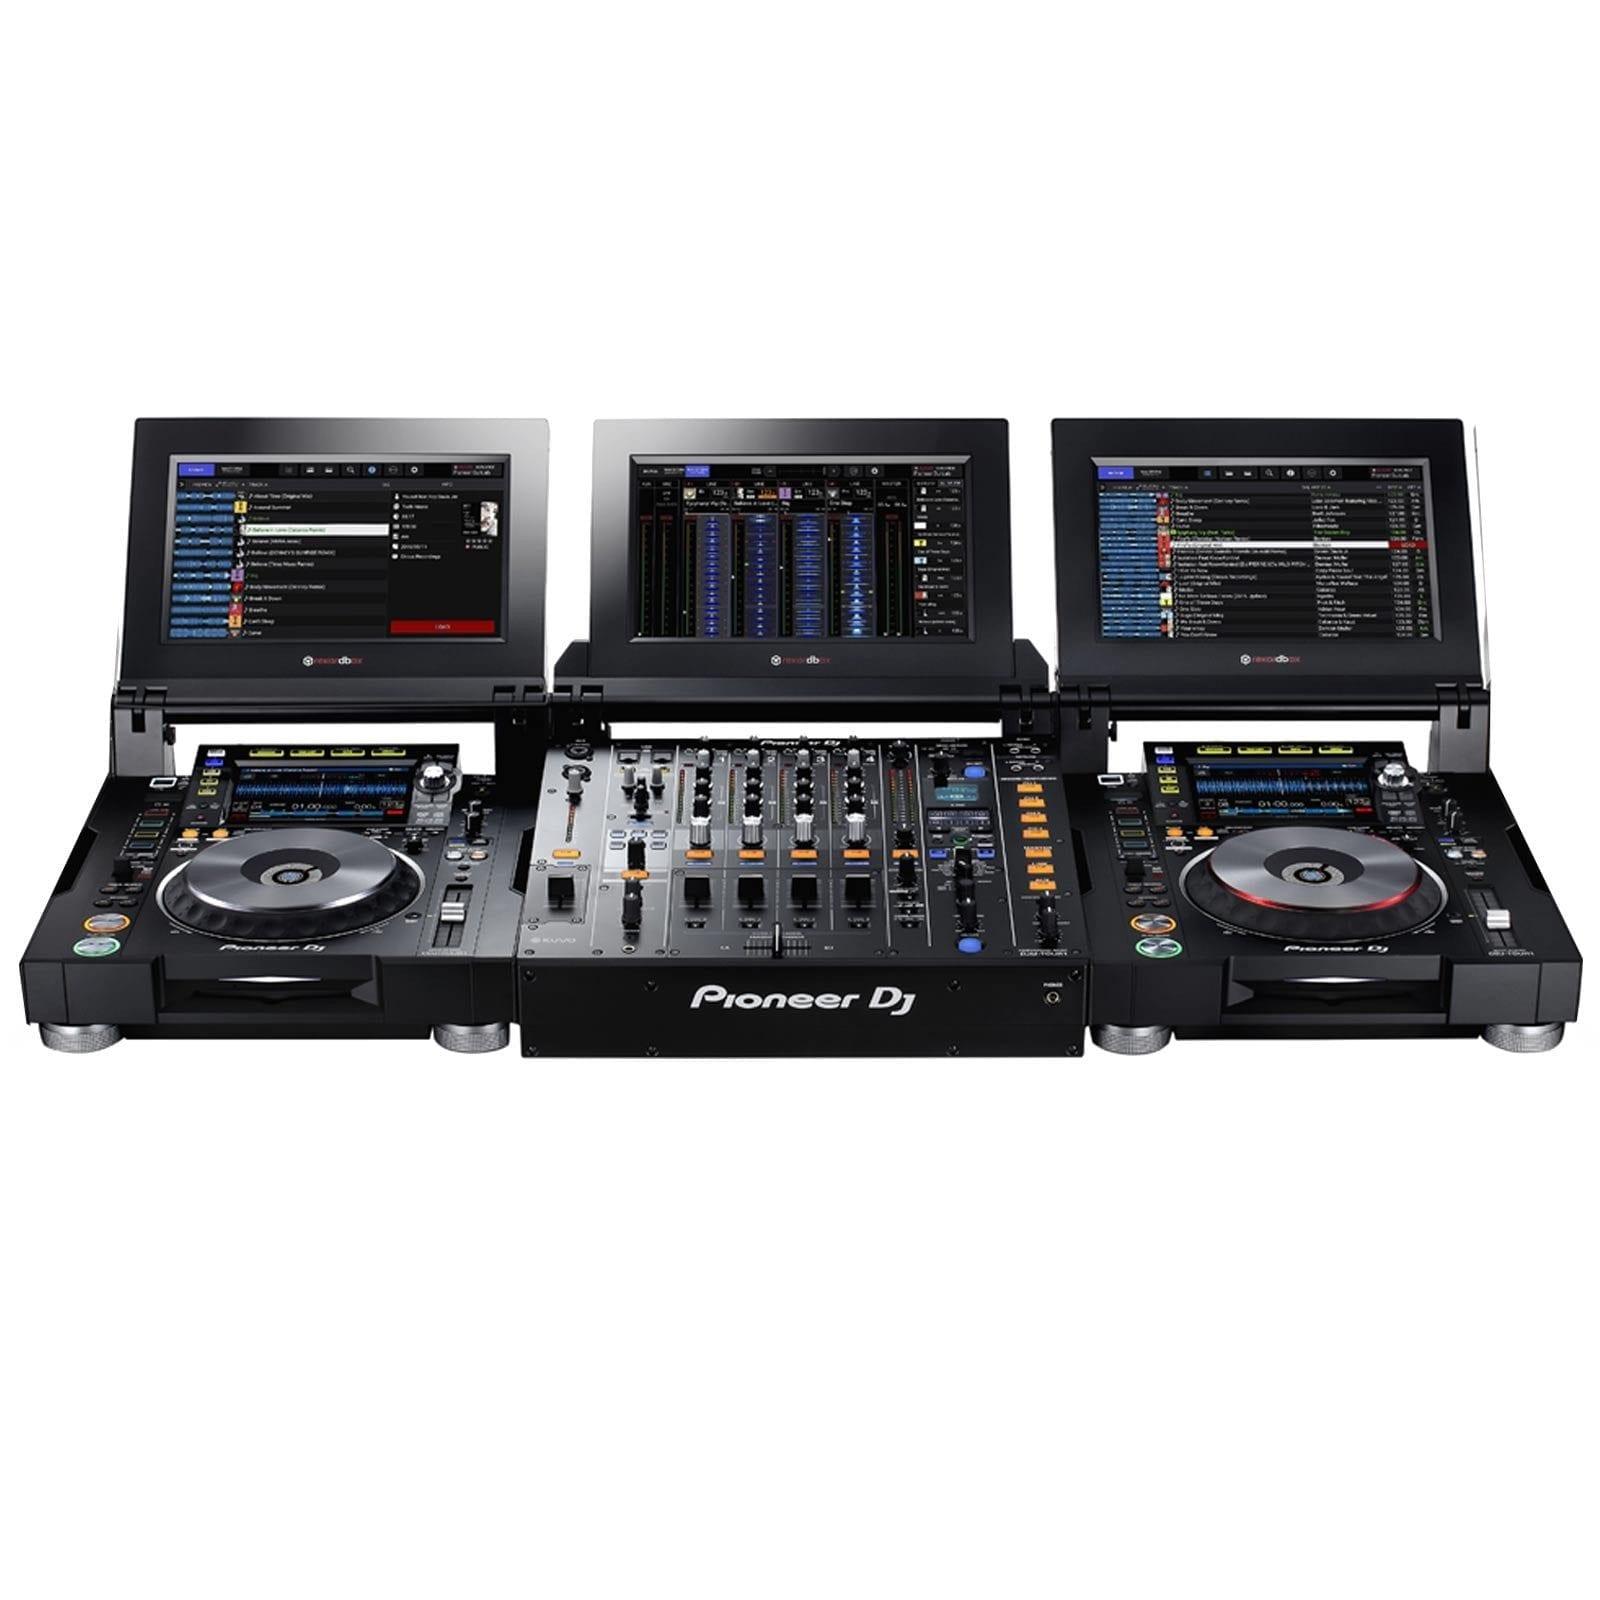 pioneer-dj-tour-system-2x-cdj-tour1-djm-tour1-dj-package-955